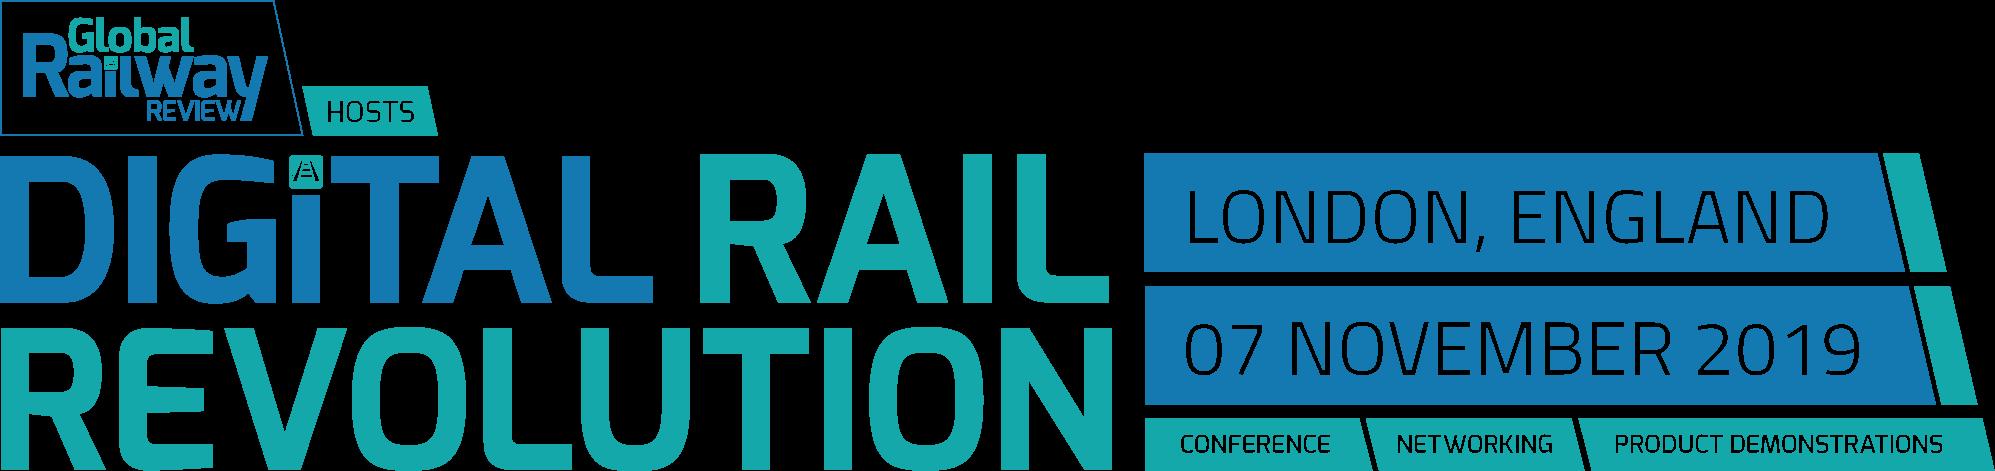 Digital Rail Revolution 2019 - Global Railway Review